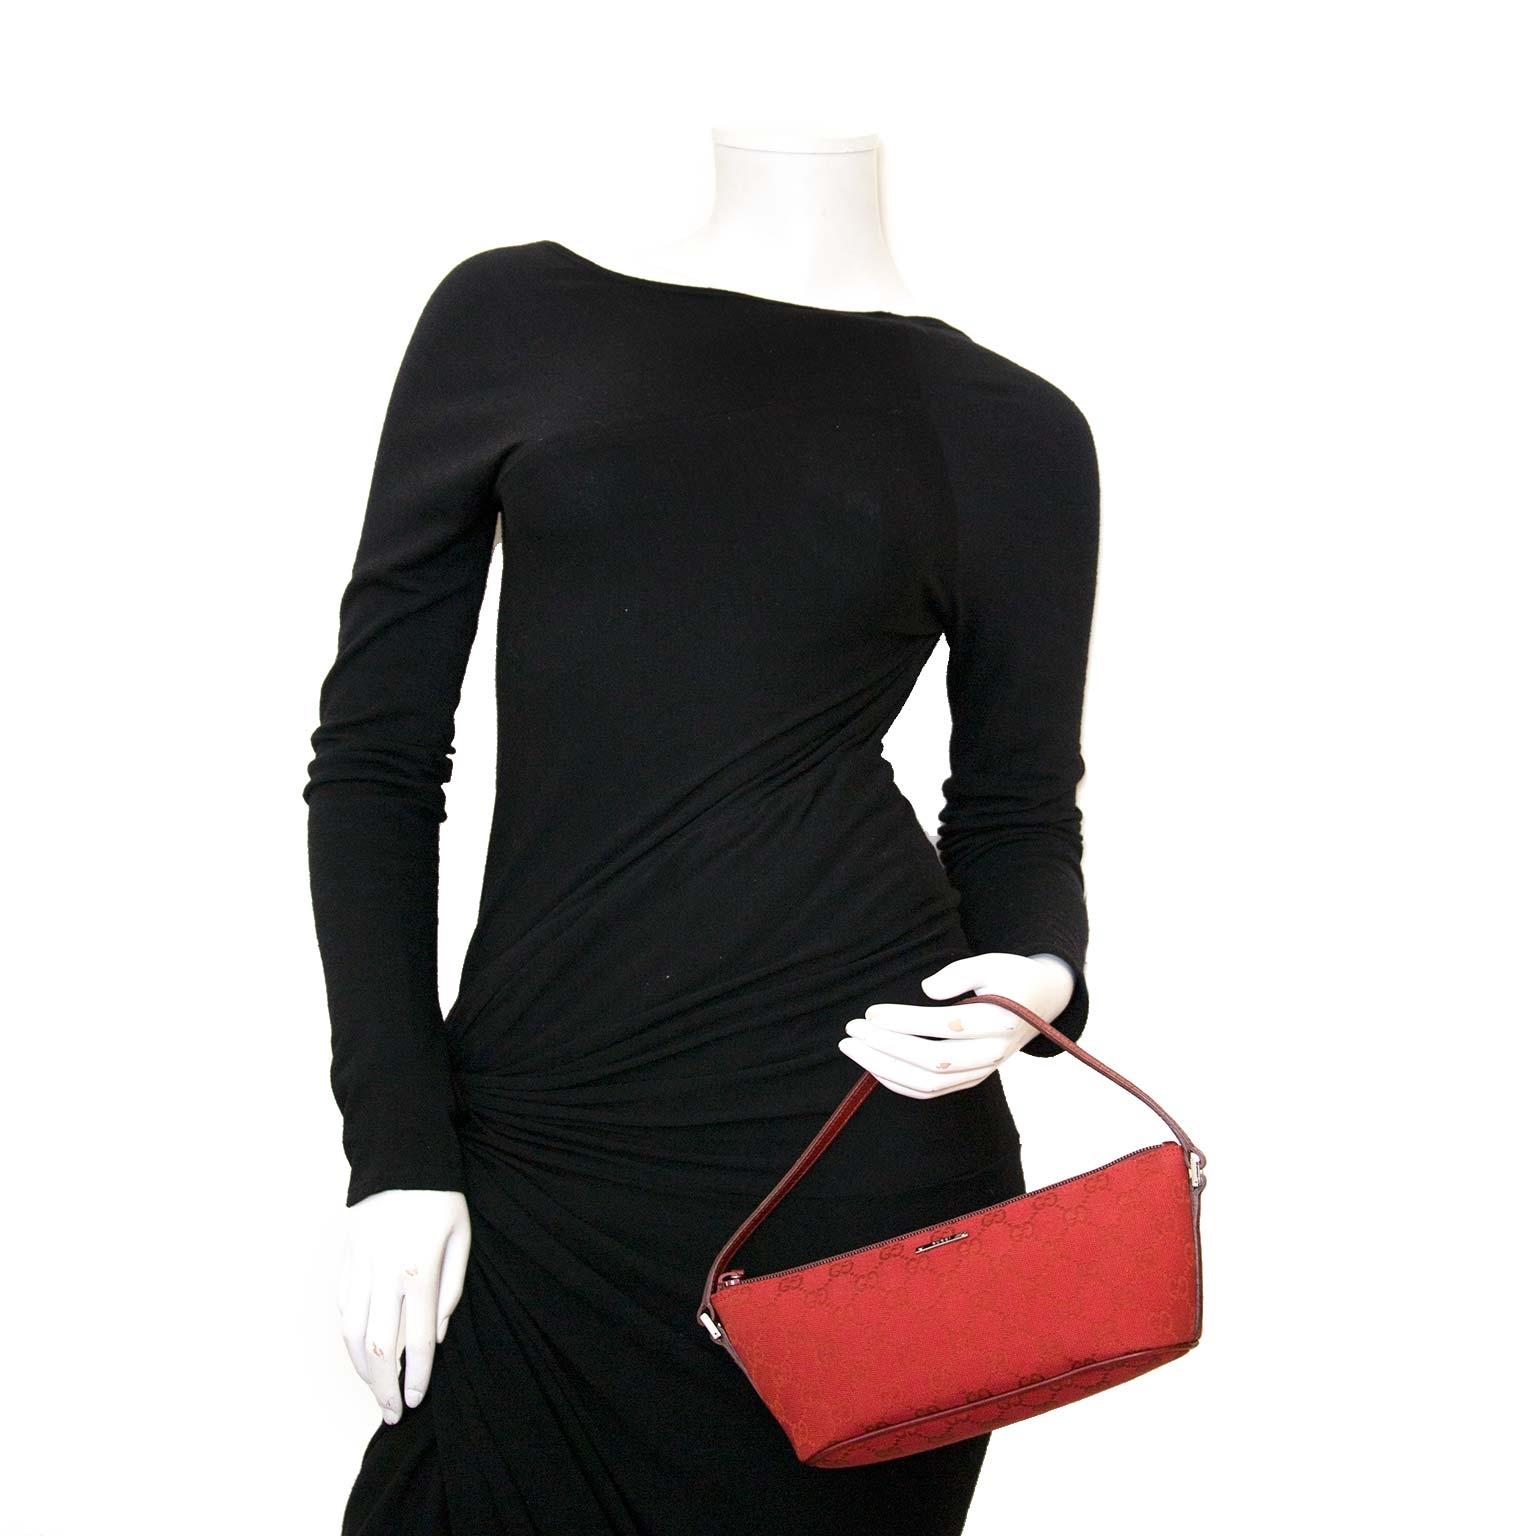 gucci rode monogram accessoire tasje nu te koop bij labellov vintage mode webshop belgië